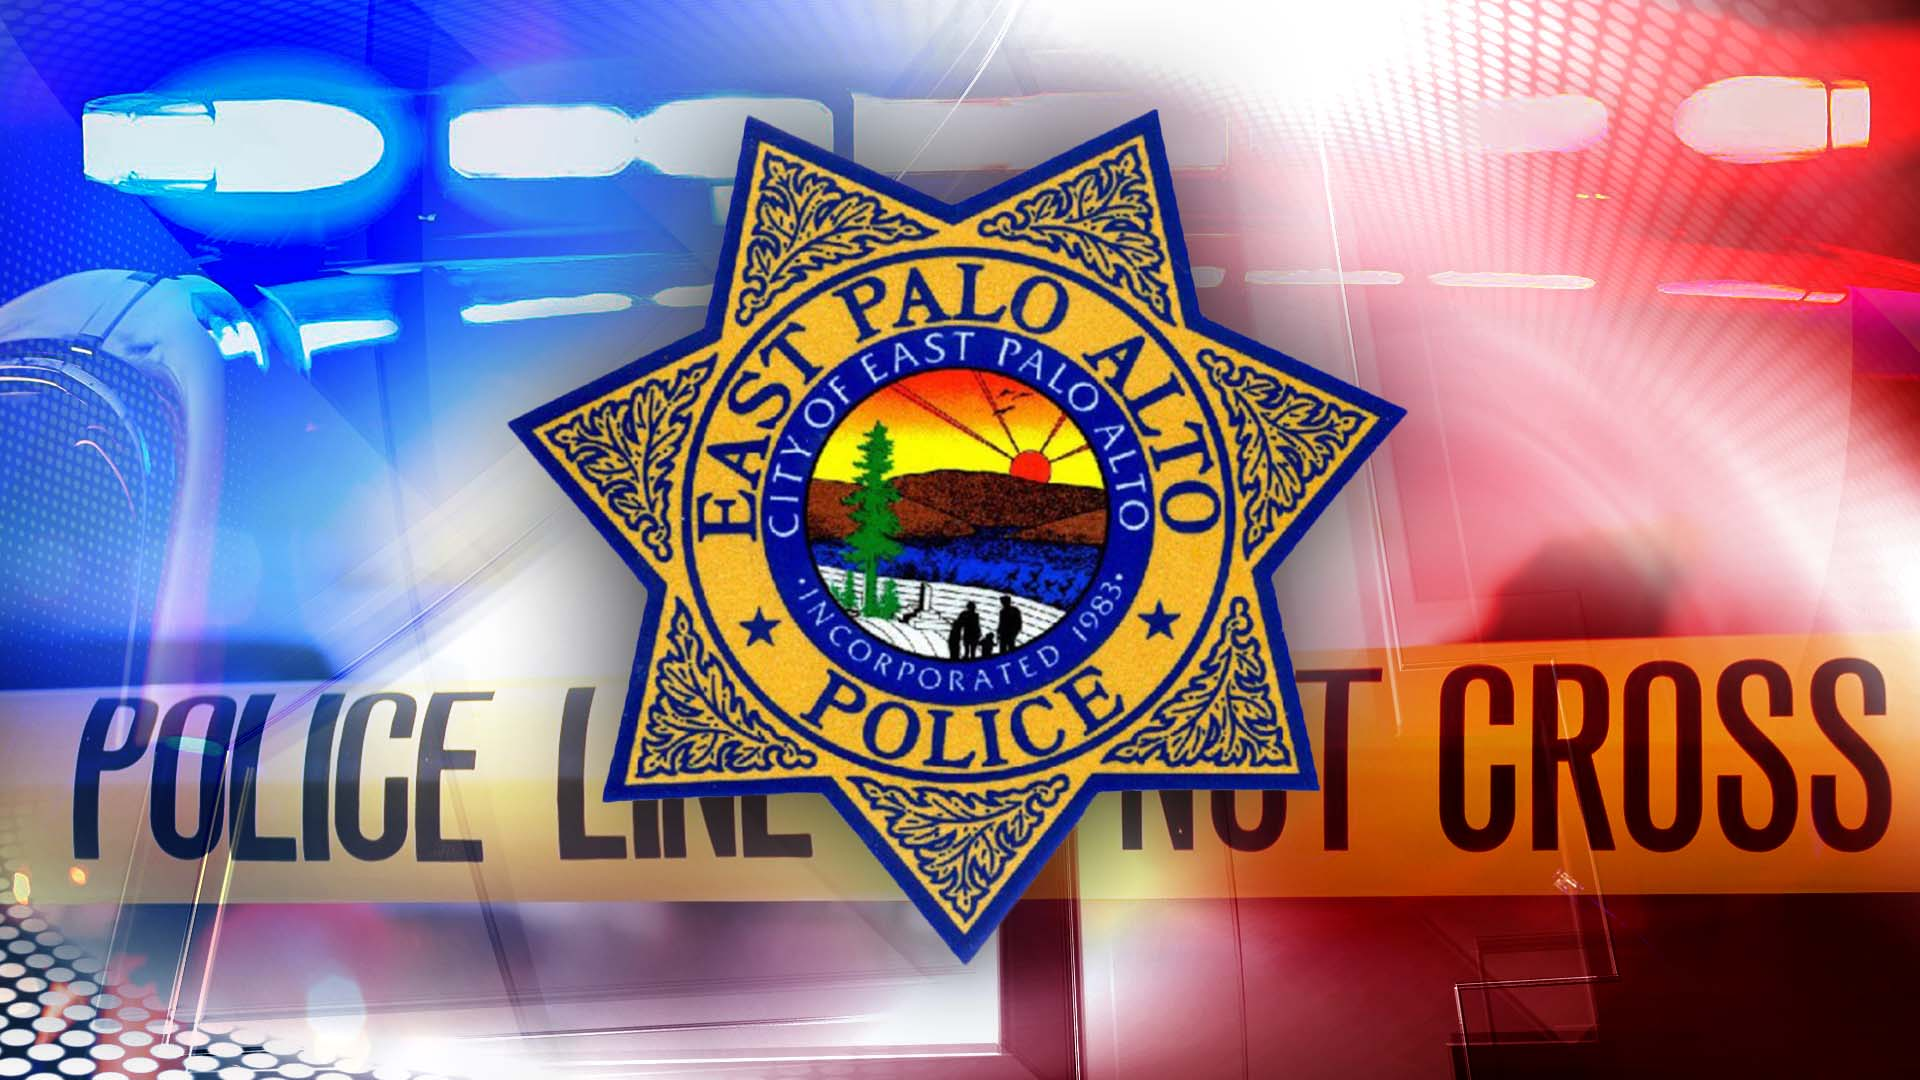 FS Police East Palo Alto_1560552852477.jpg.jpg